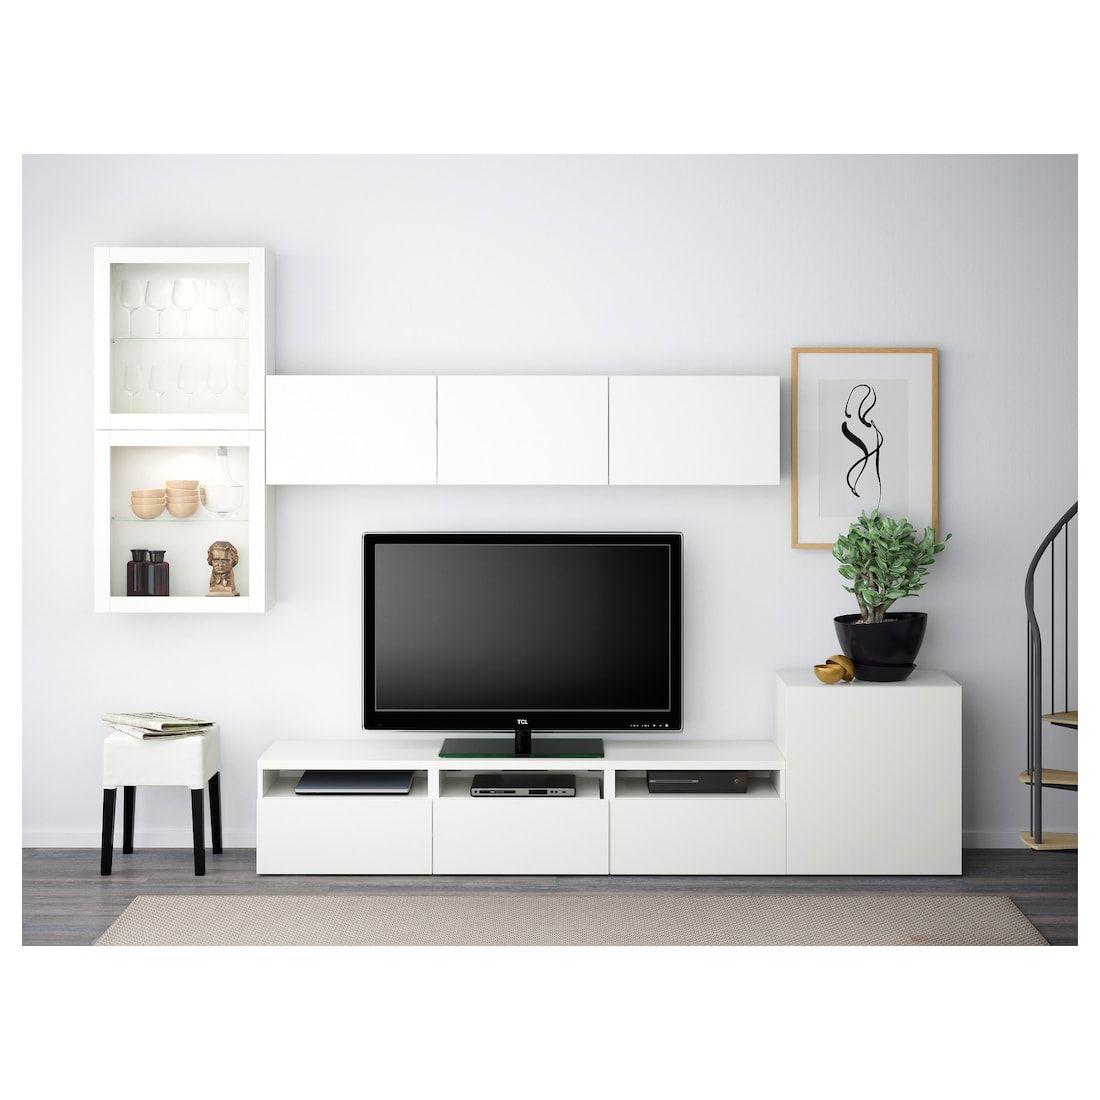 Bestå Tv Storage Combination Glass Doors Lappviken Sindvik White Clear Glass Ikea Ikea Living Room Living Room Tv Wall Living Room Tv